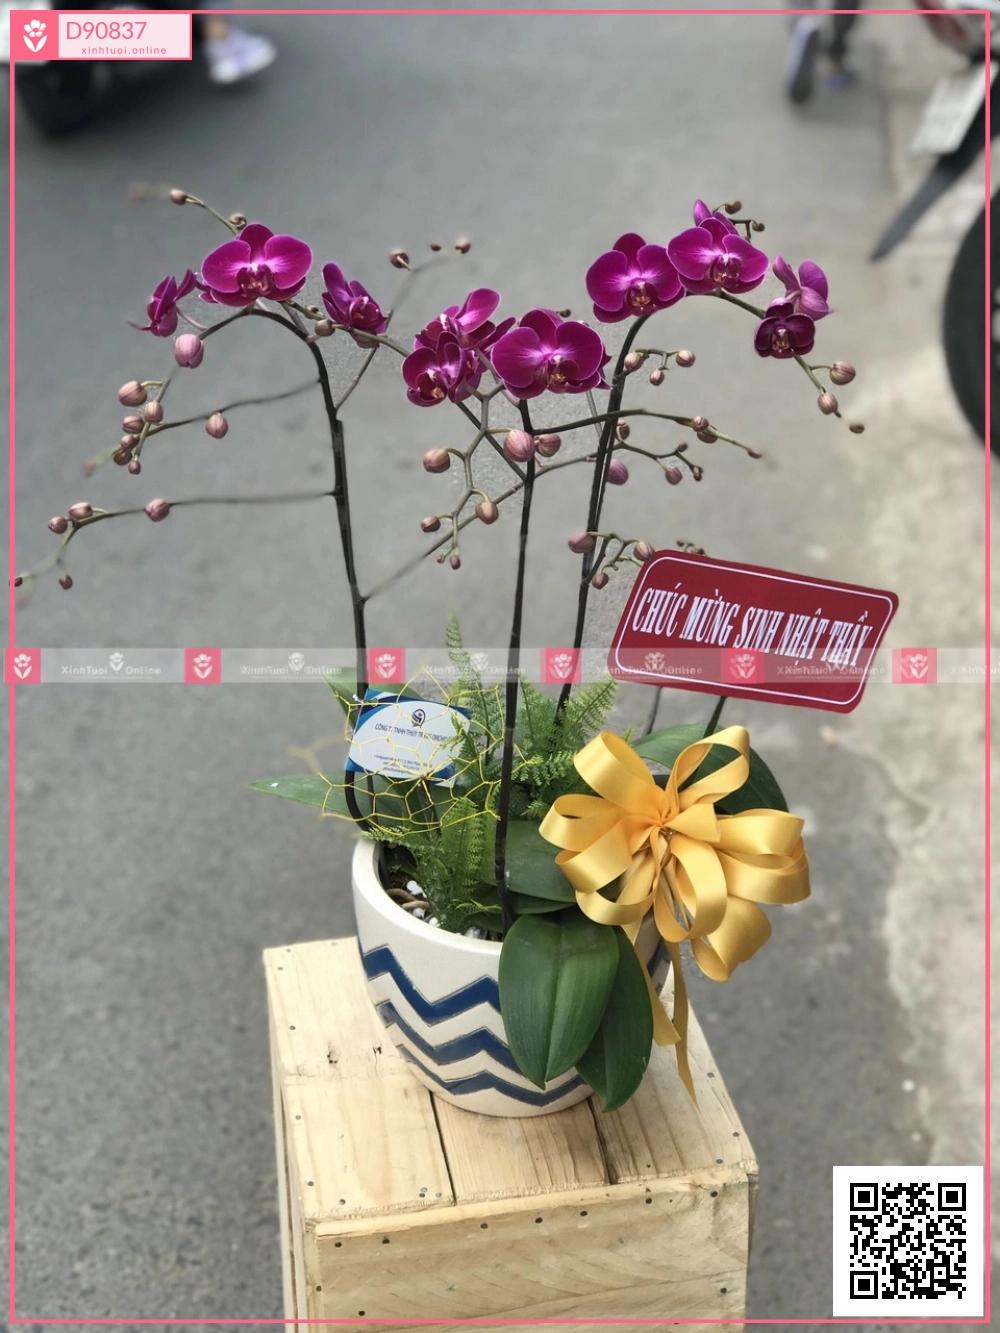 Lộc phát - D90837 - xinhtuoi.online